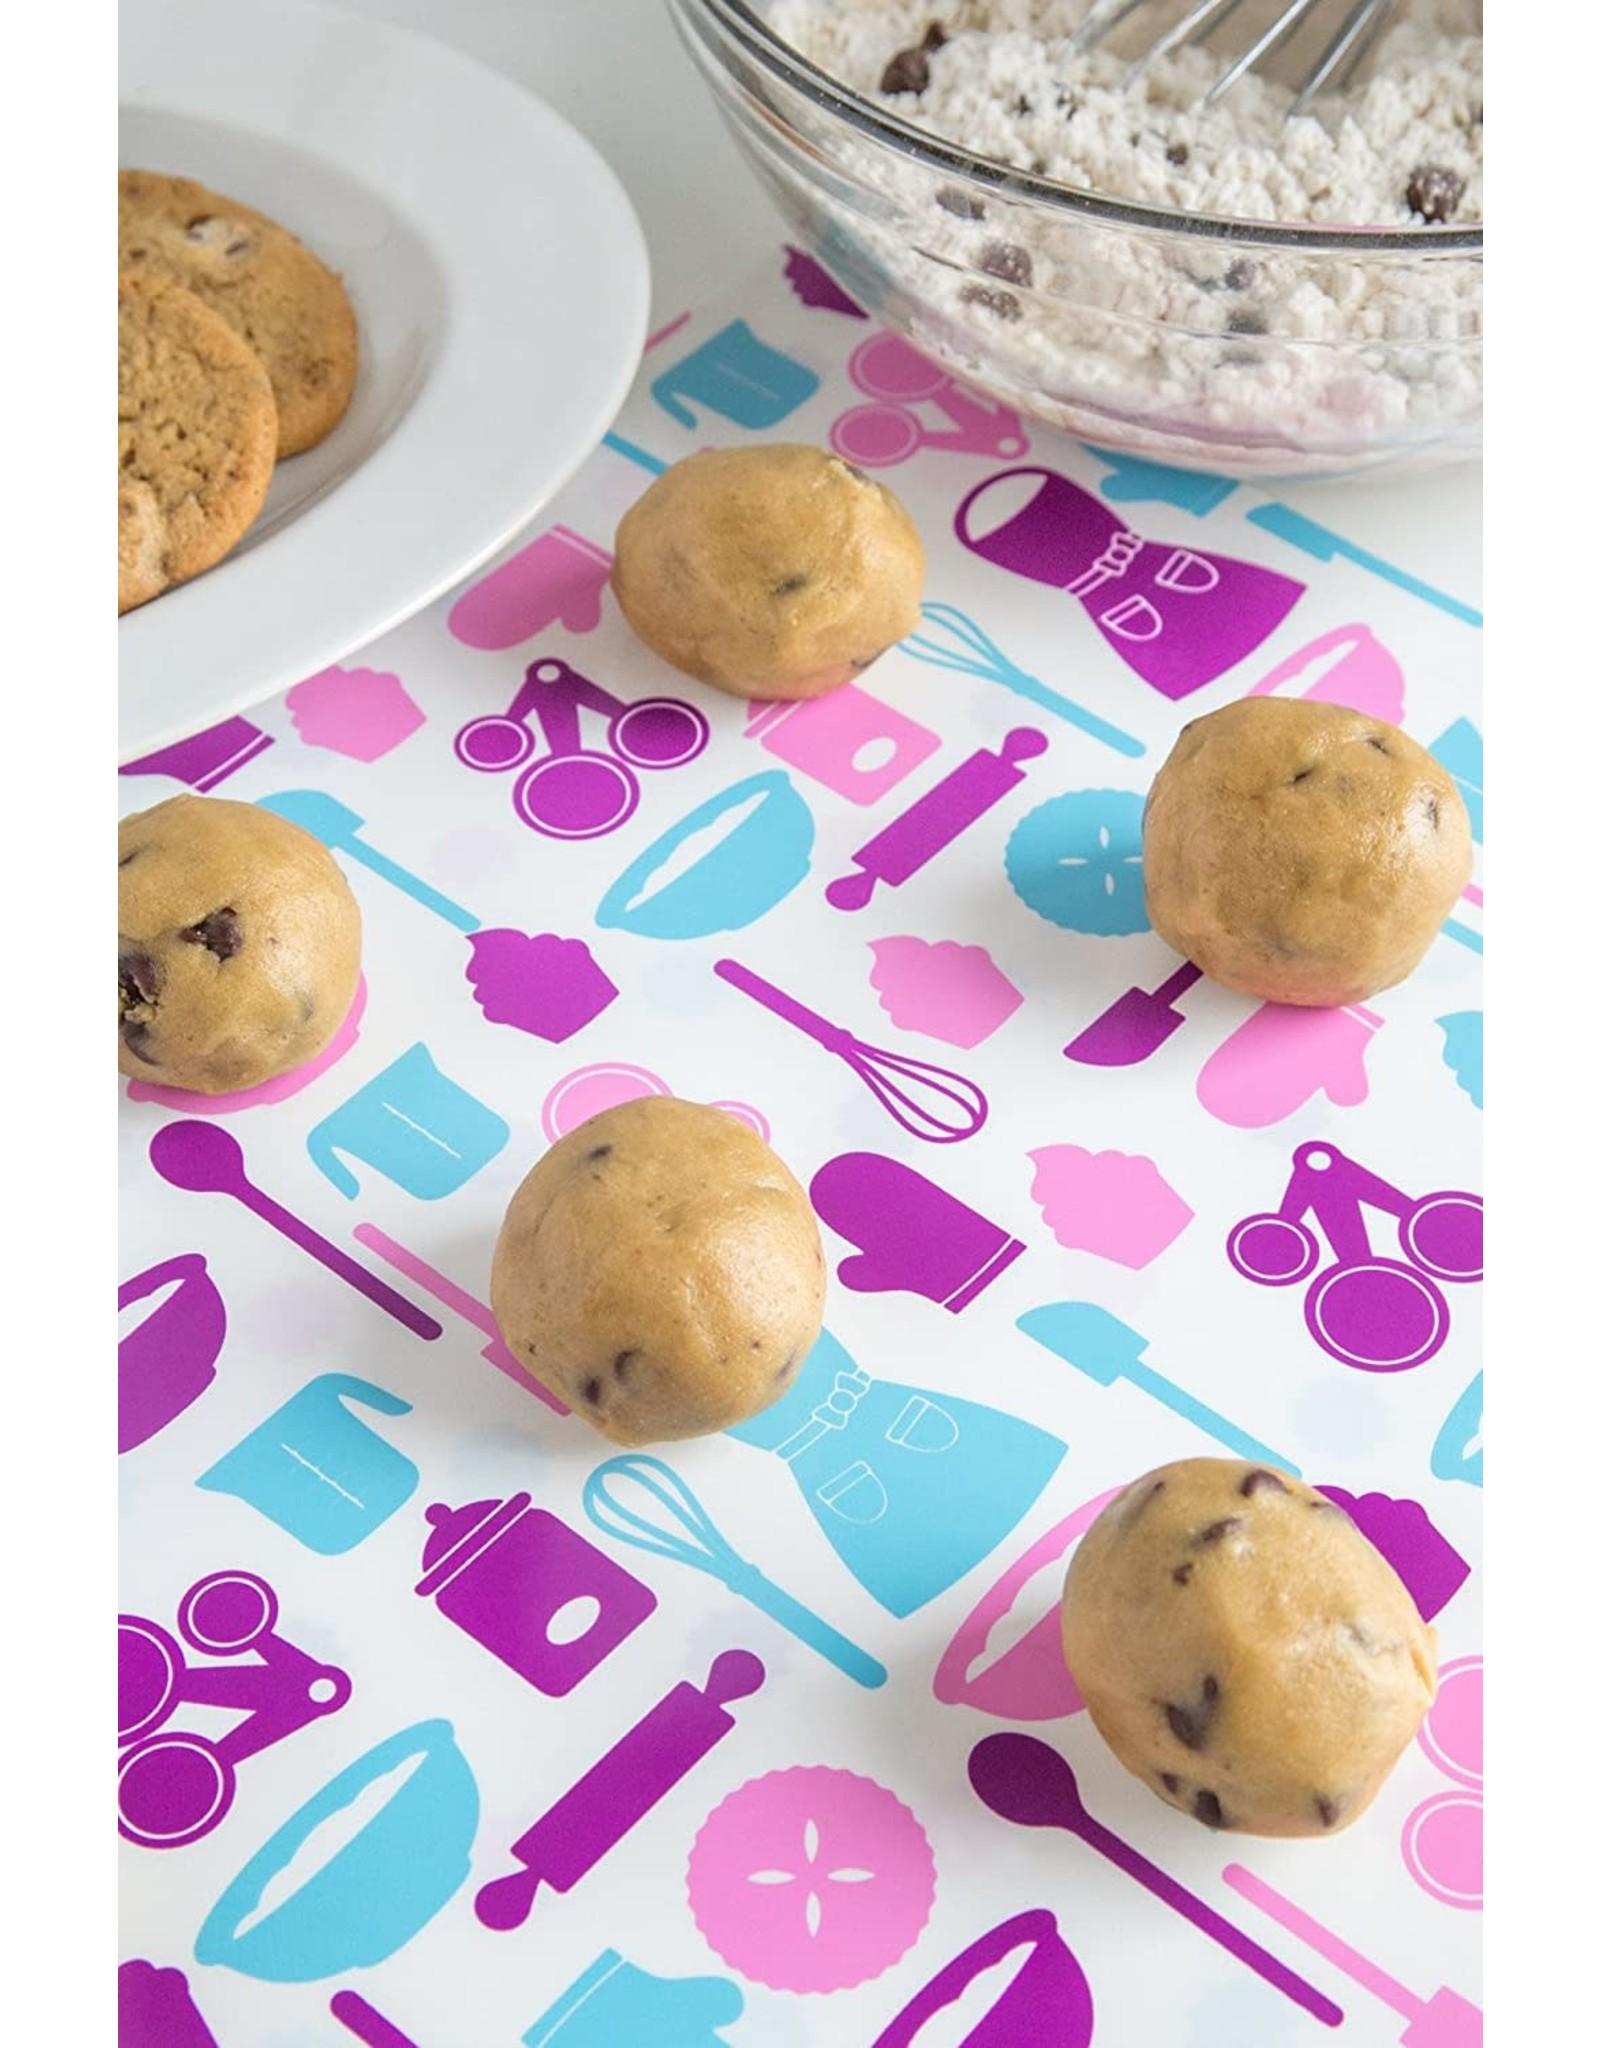 Fox Run BAKELICIOUS Baking Mix 2-Sided Silicone Bake Mat